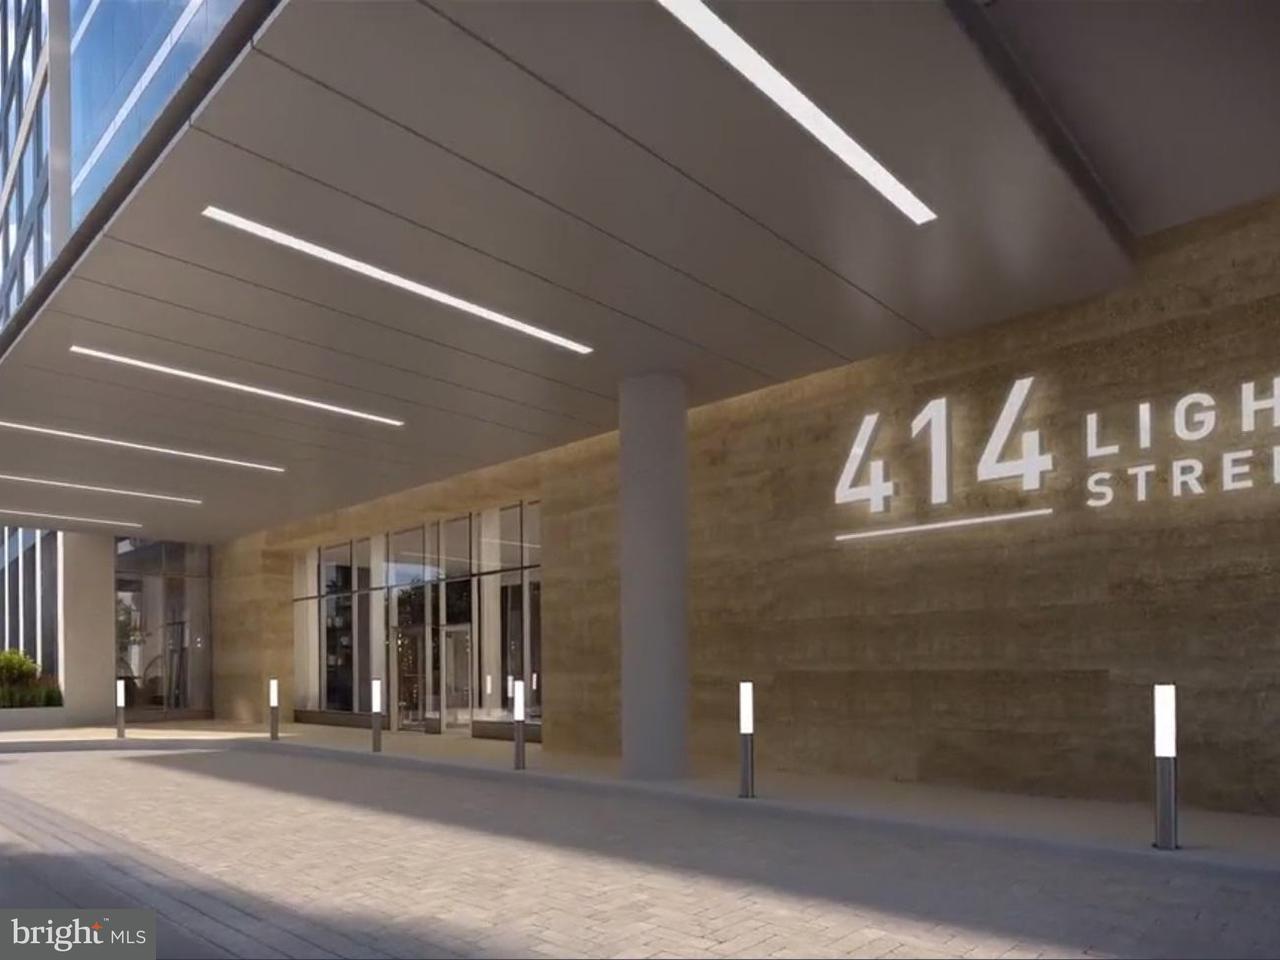 Condominium for Rent at 414 Light St #509 Baltimore, Maryland 21202 United States